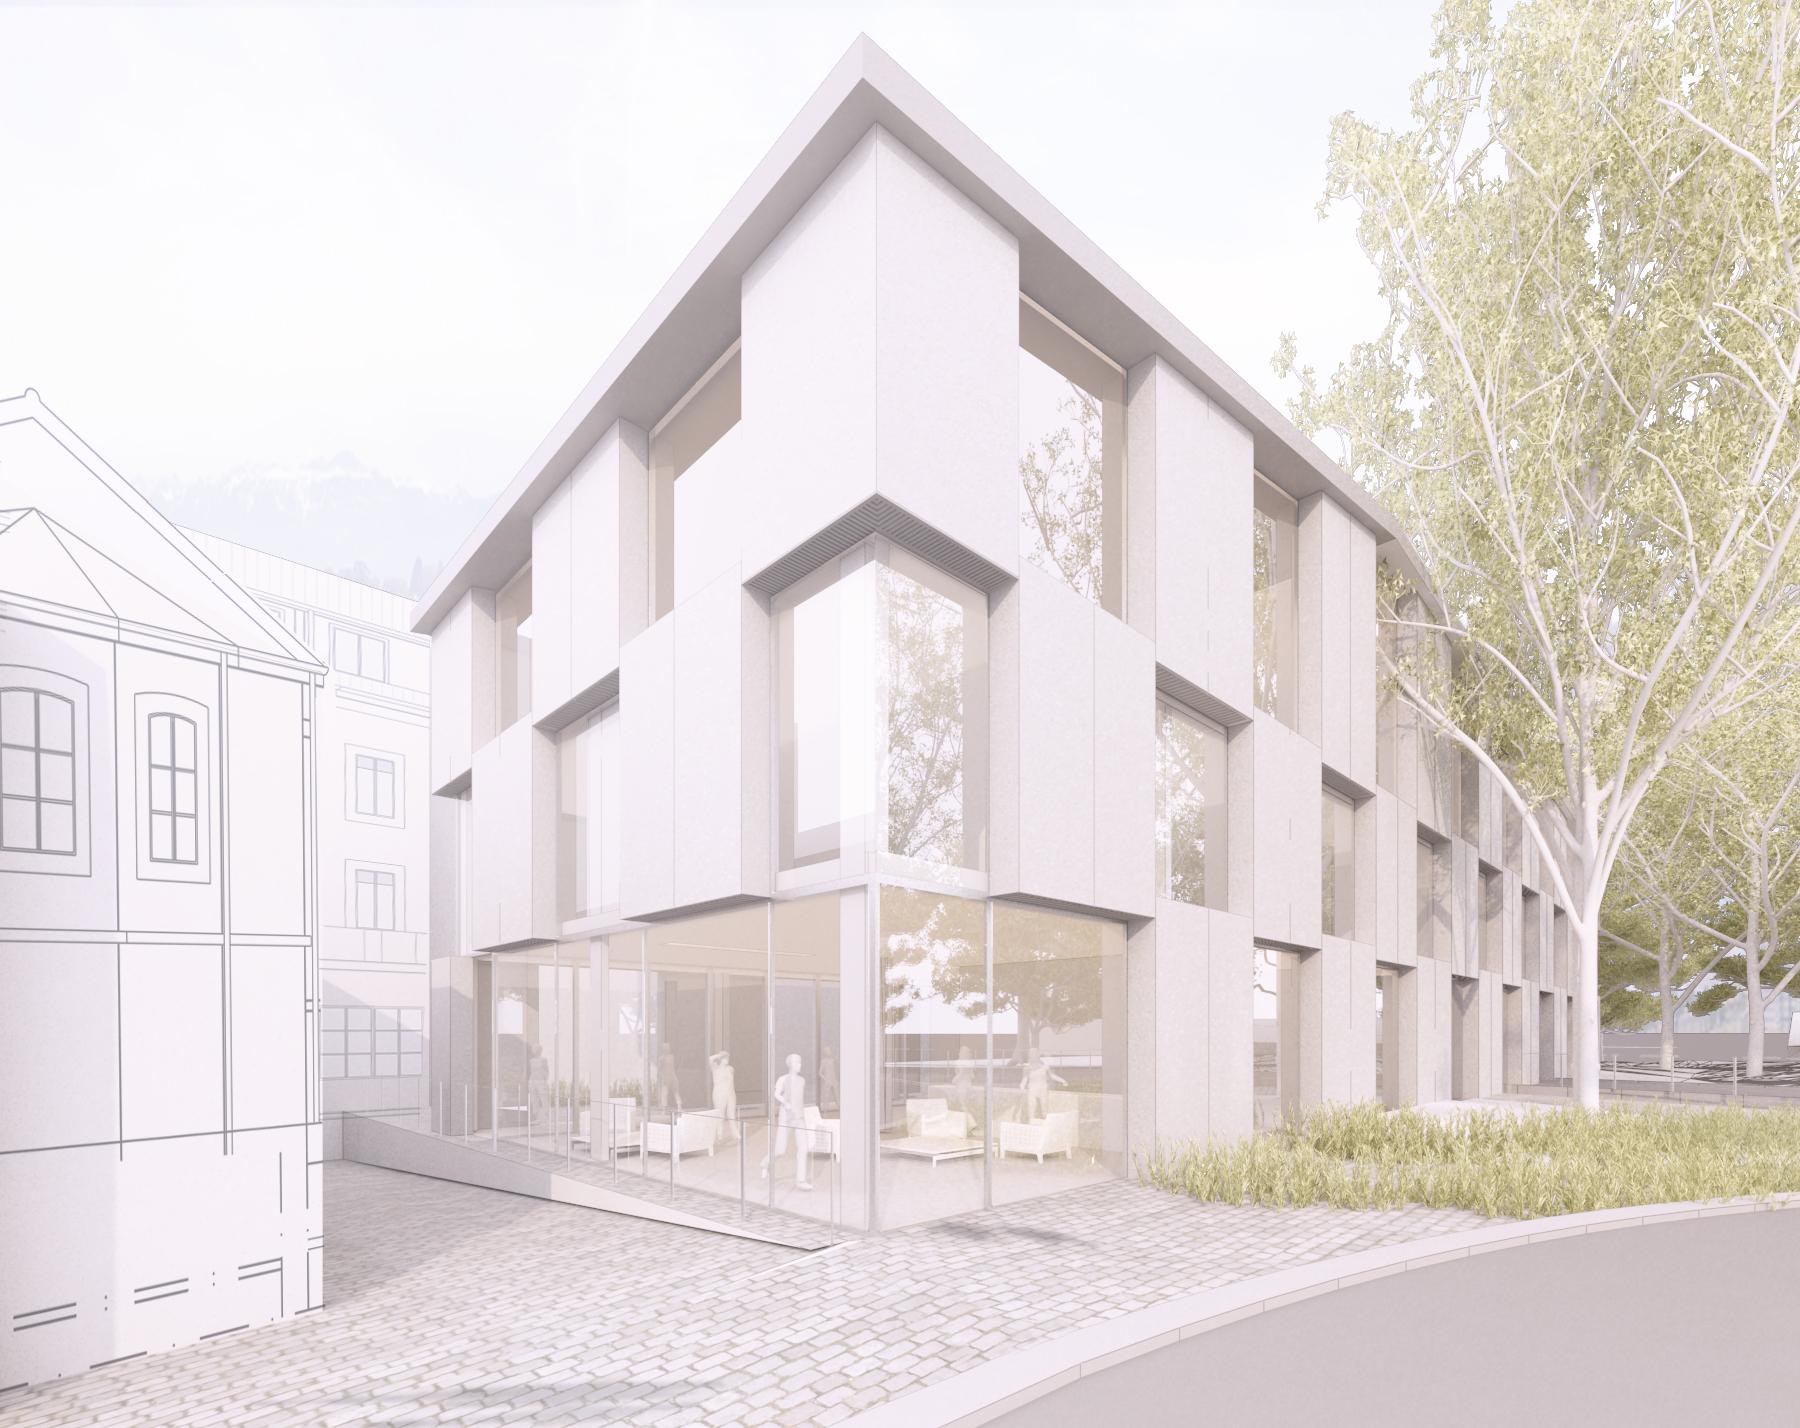 FMC Aged care home of Vevey  Vevey,Switzerland